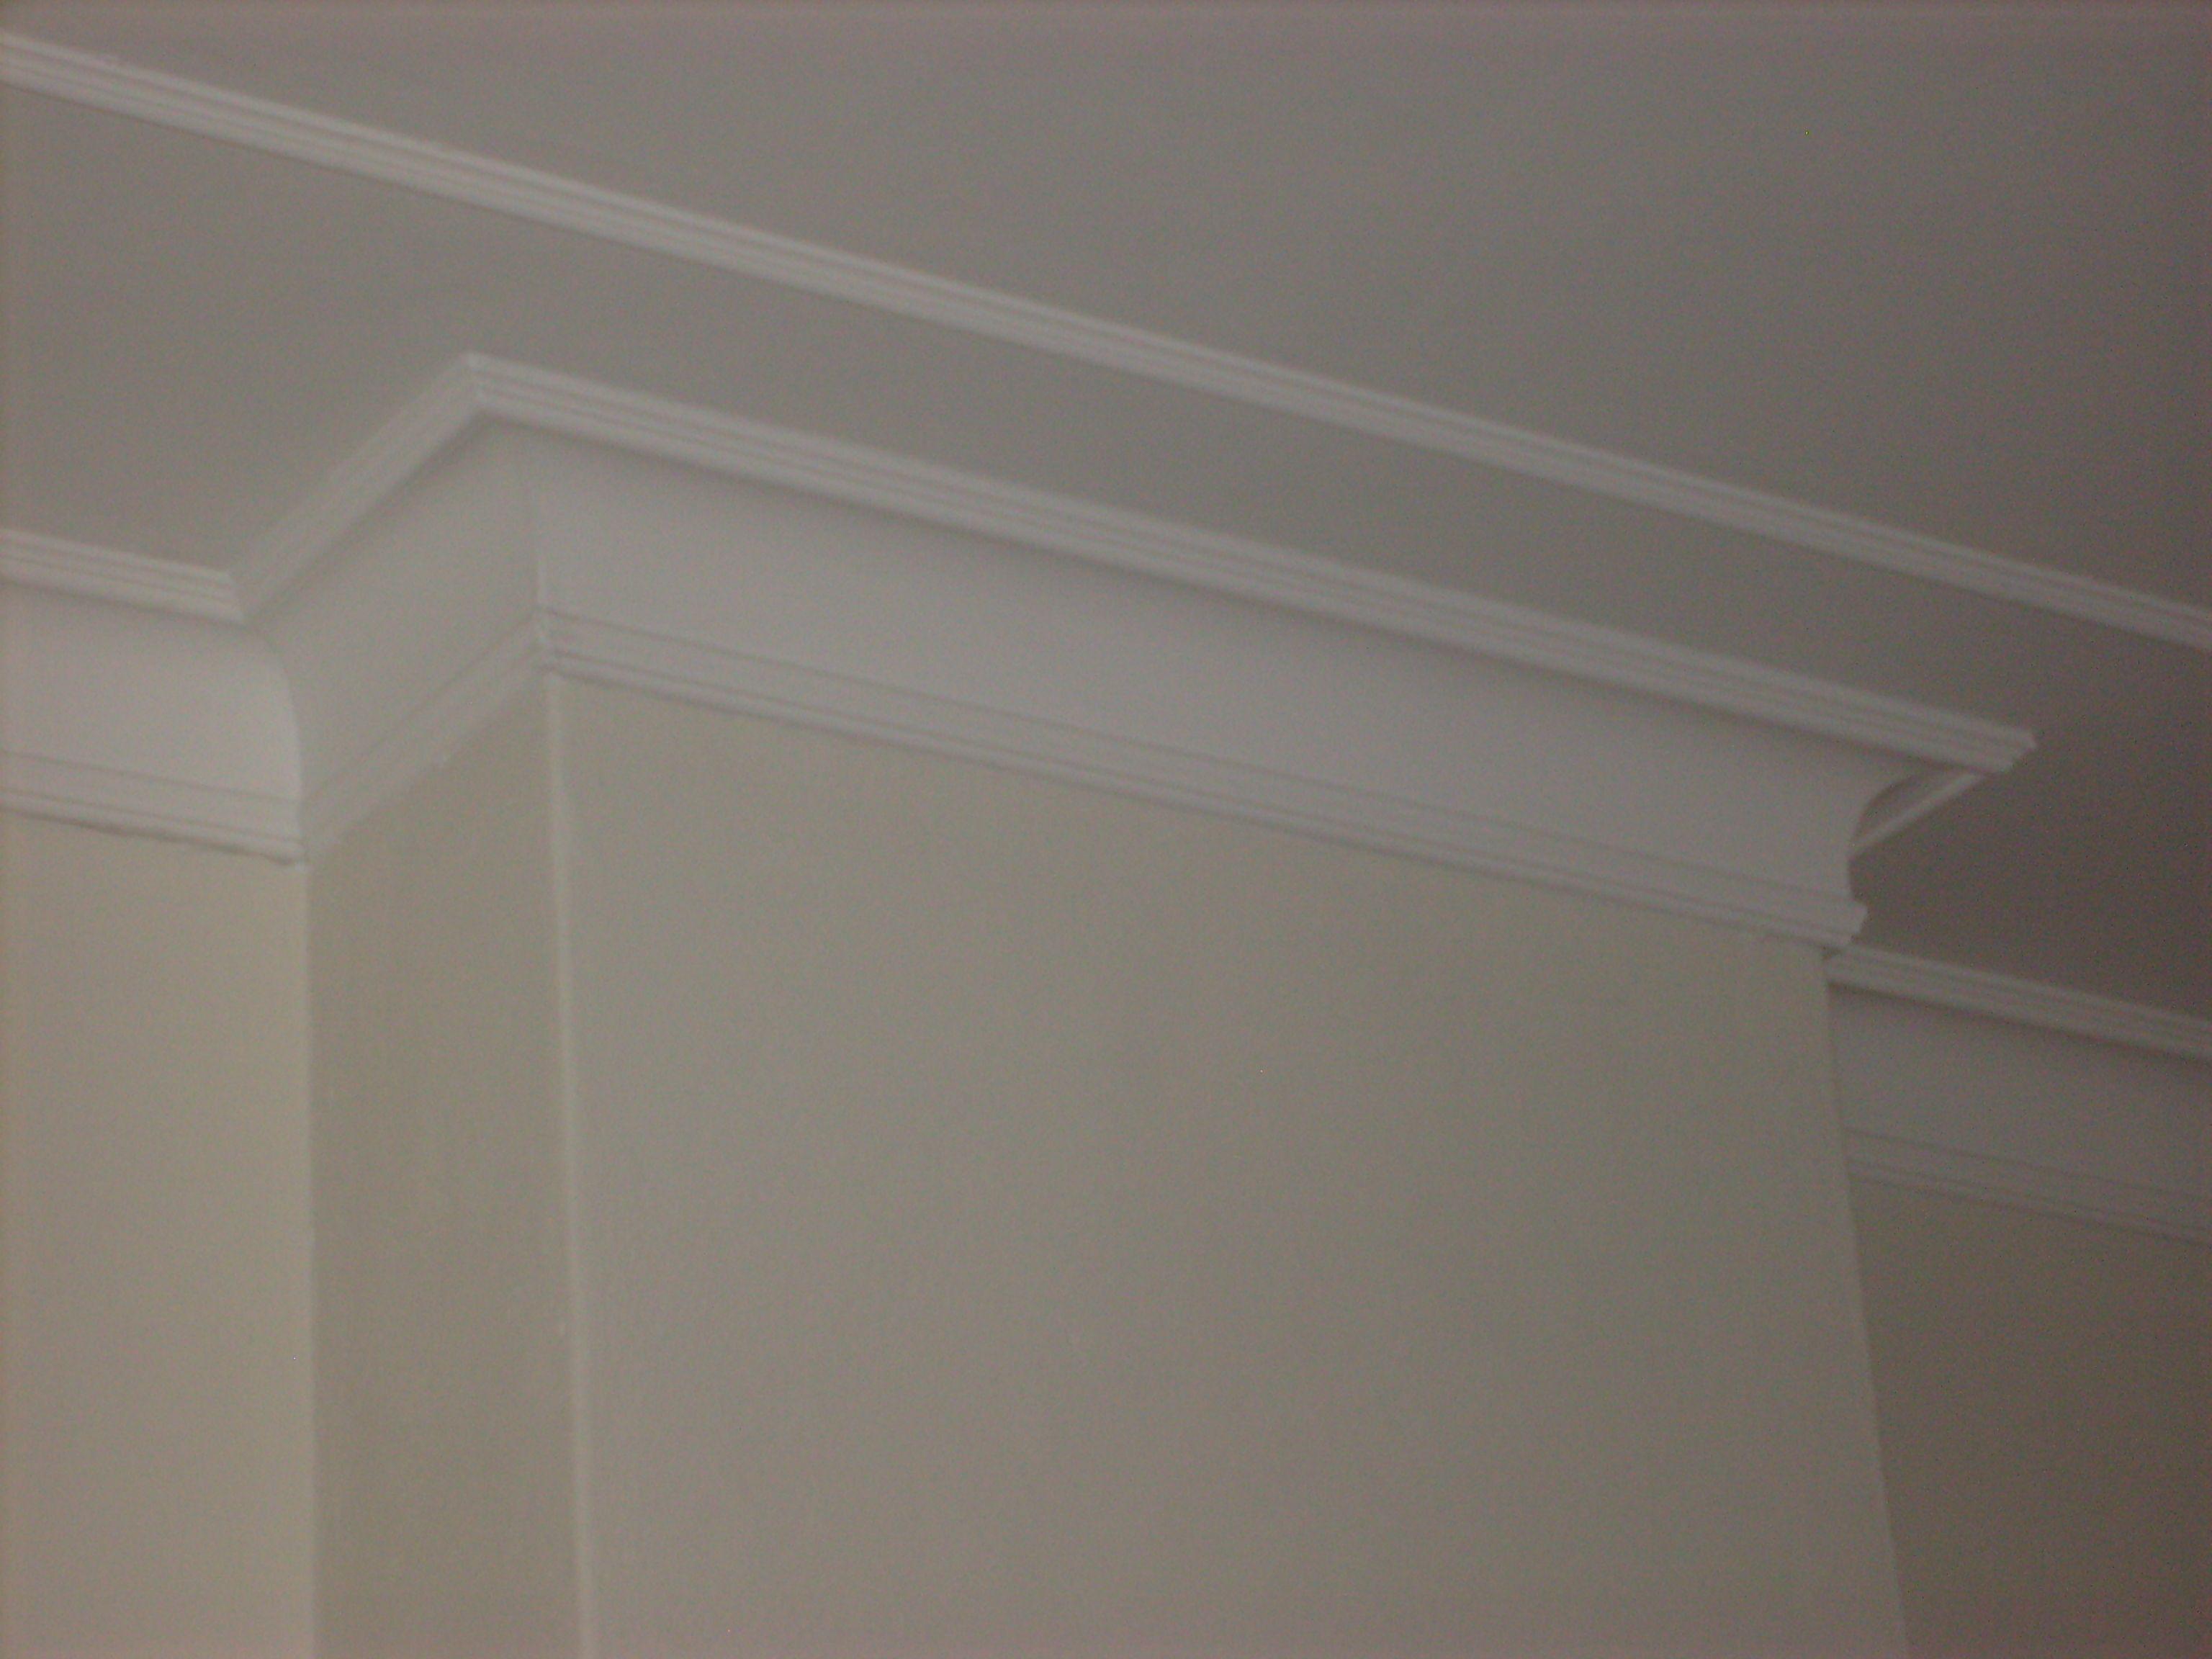 Badkamer Plafond Praxis : Kunstof tegels badkamer praxis sierstrip plafond bouwmaterialen